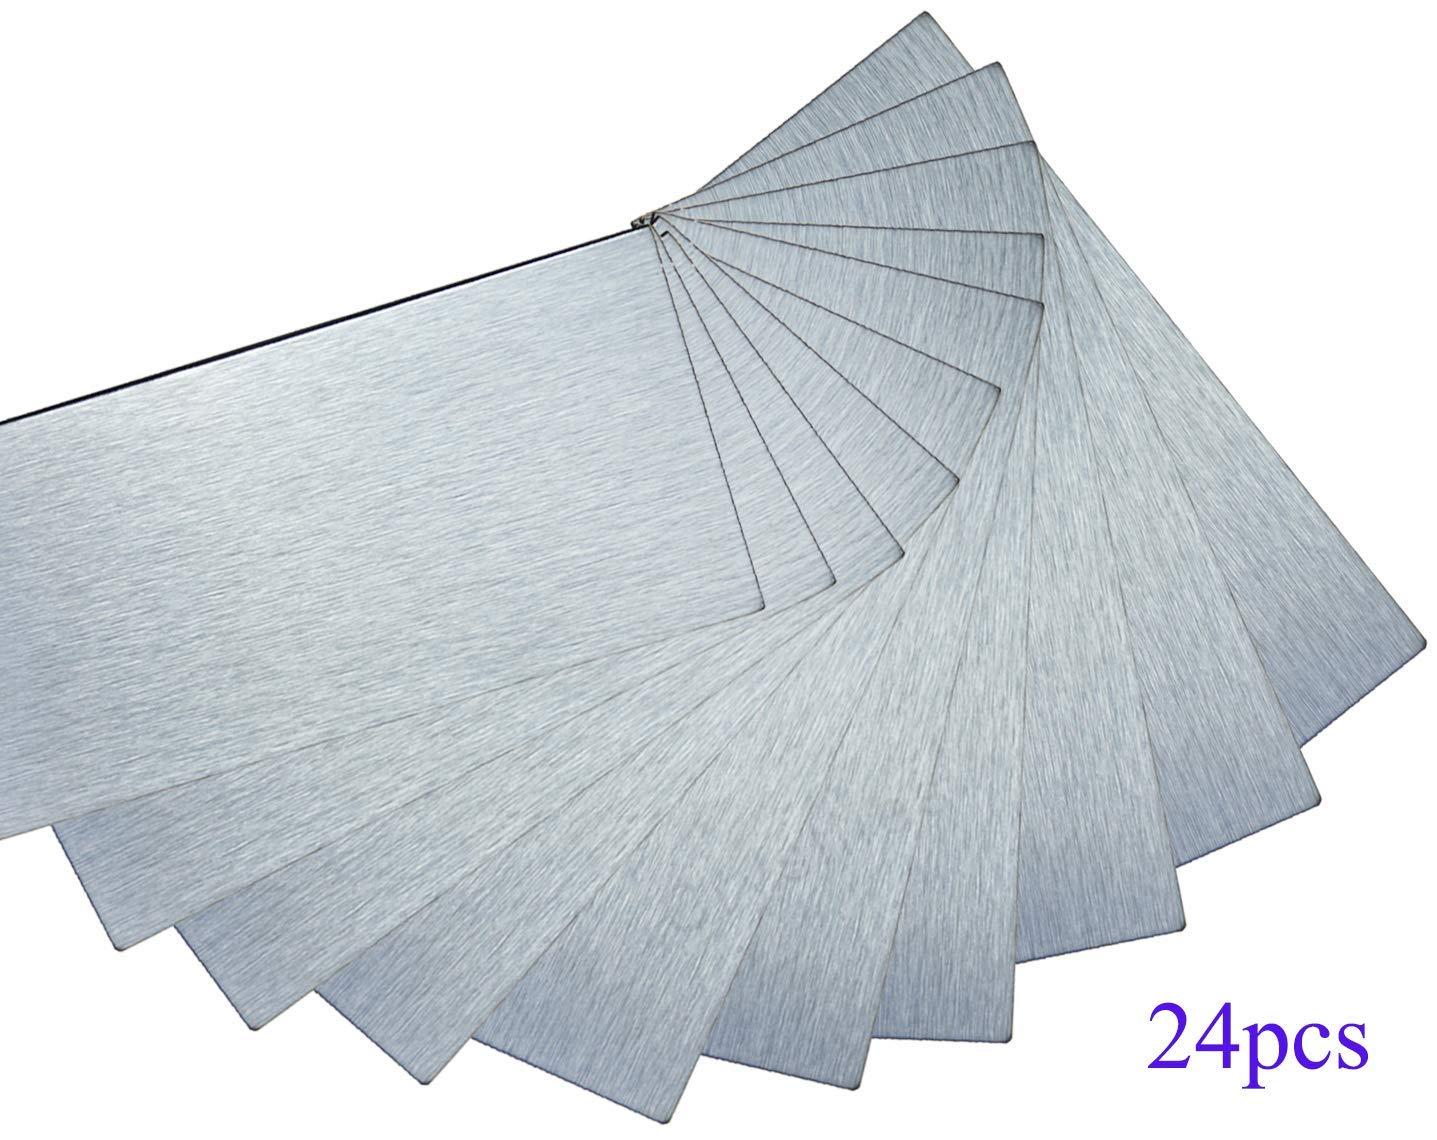 Ehinew Cooling Peltier Plate Module TEC1-12706 Heatsink Thermoelectric Cooler 40 x 40mm